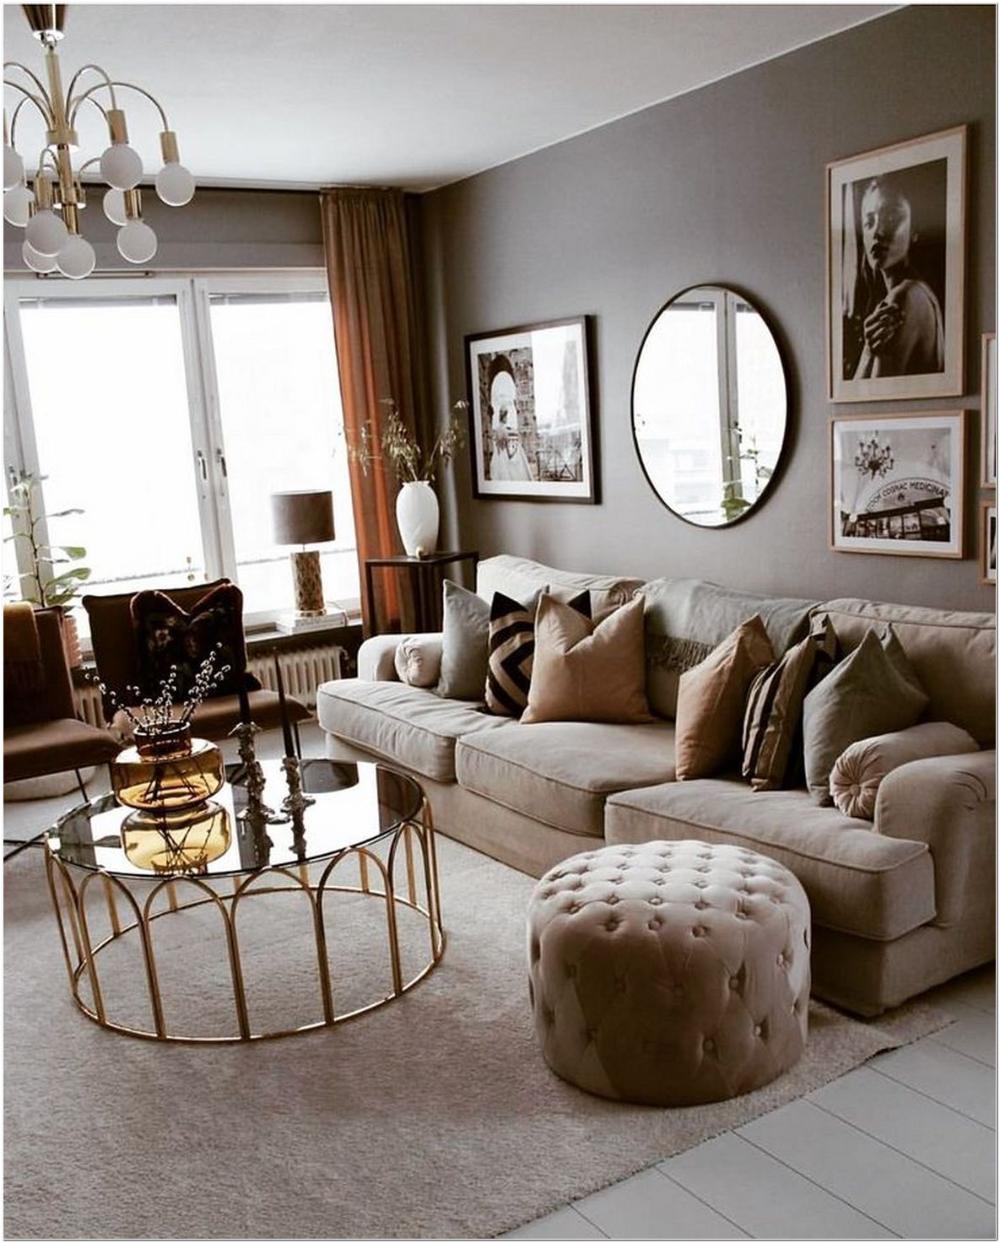 75 Cozy Apartment Living Room Decorating Ideas 16 Living Room Designs Living Room Decor Apartment Living Decor